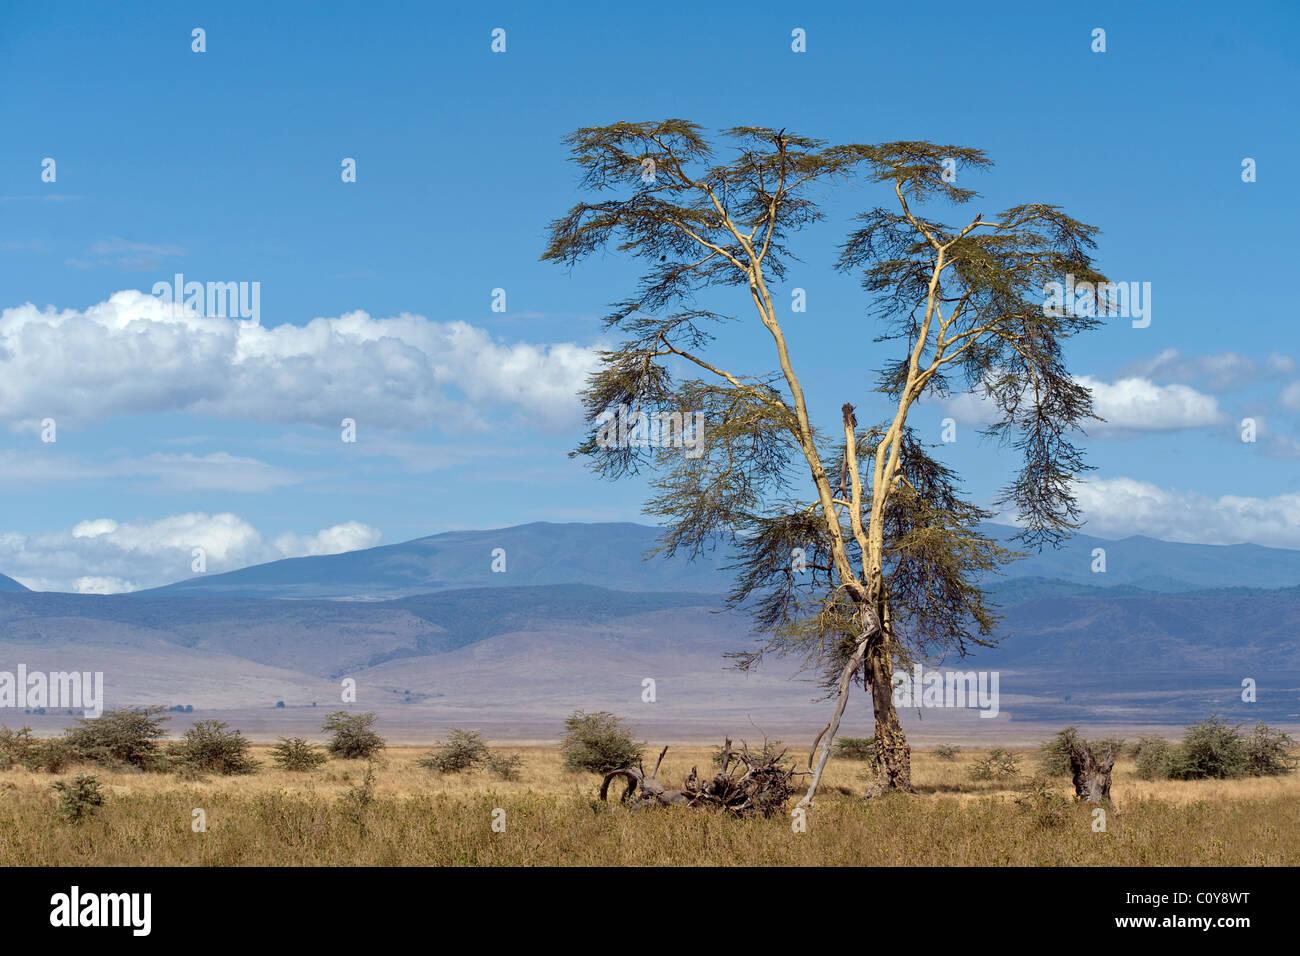 Giallo abbaiato Acacia , Acacia xanthophloea, nel cratere di Ngorongoro Tanzania Immagini Stock